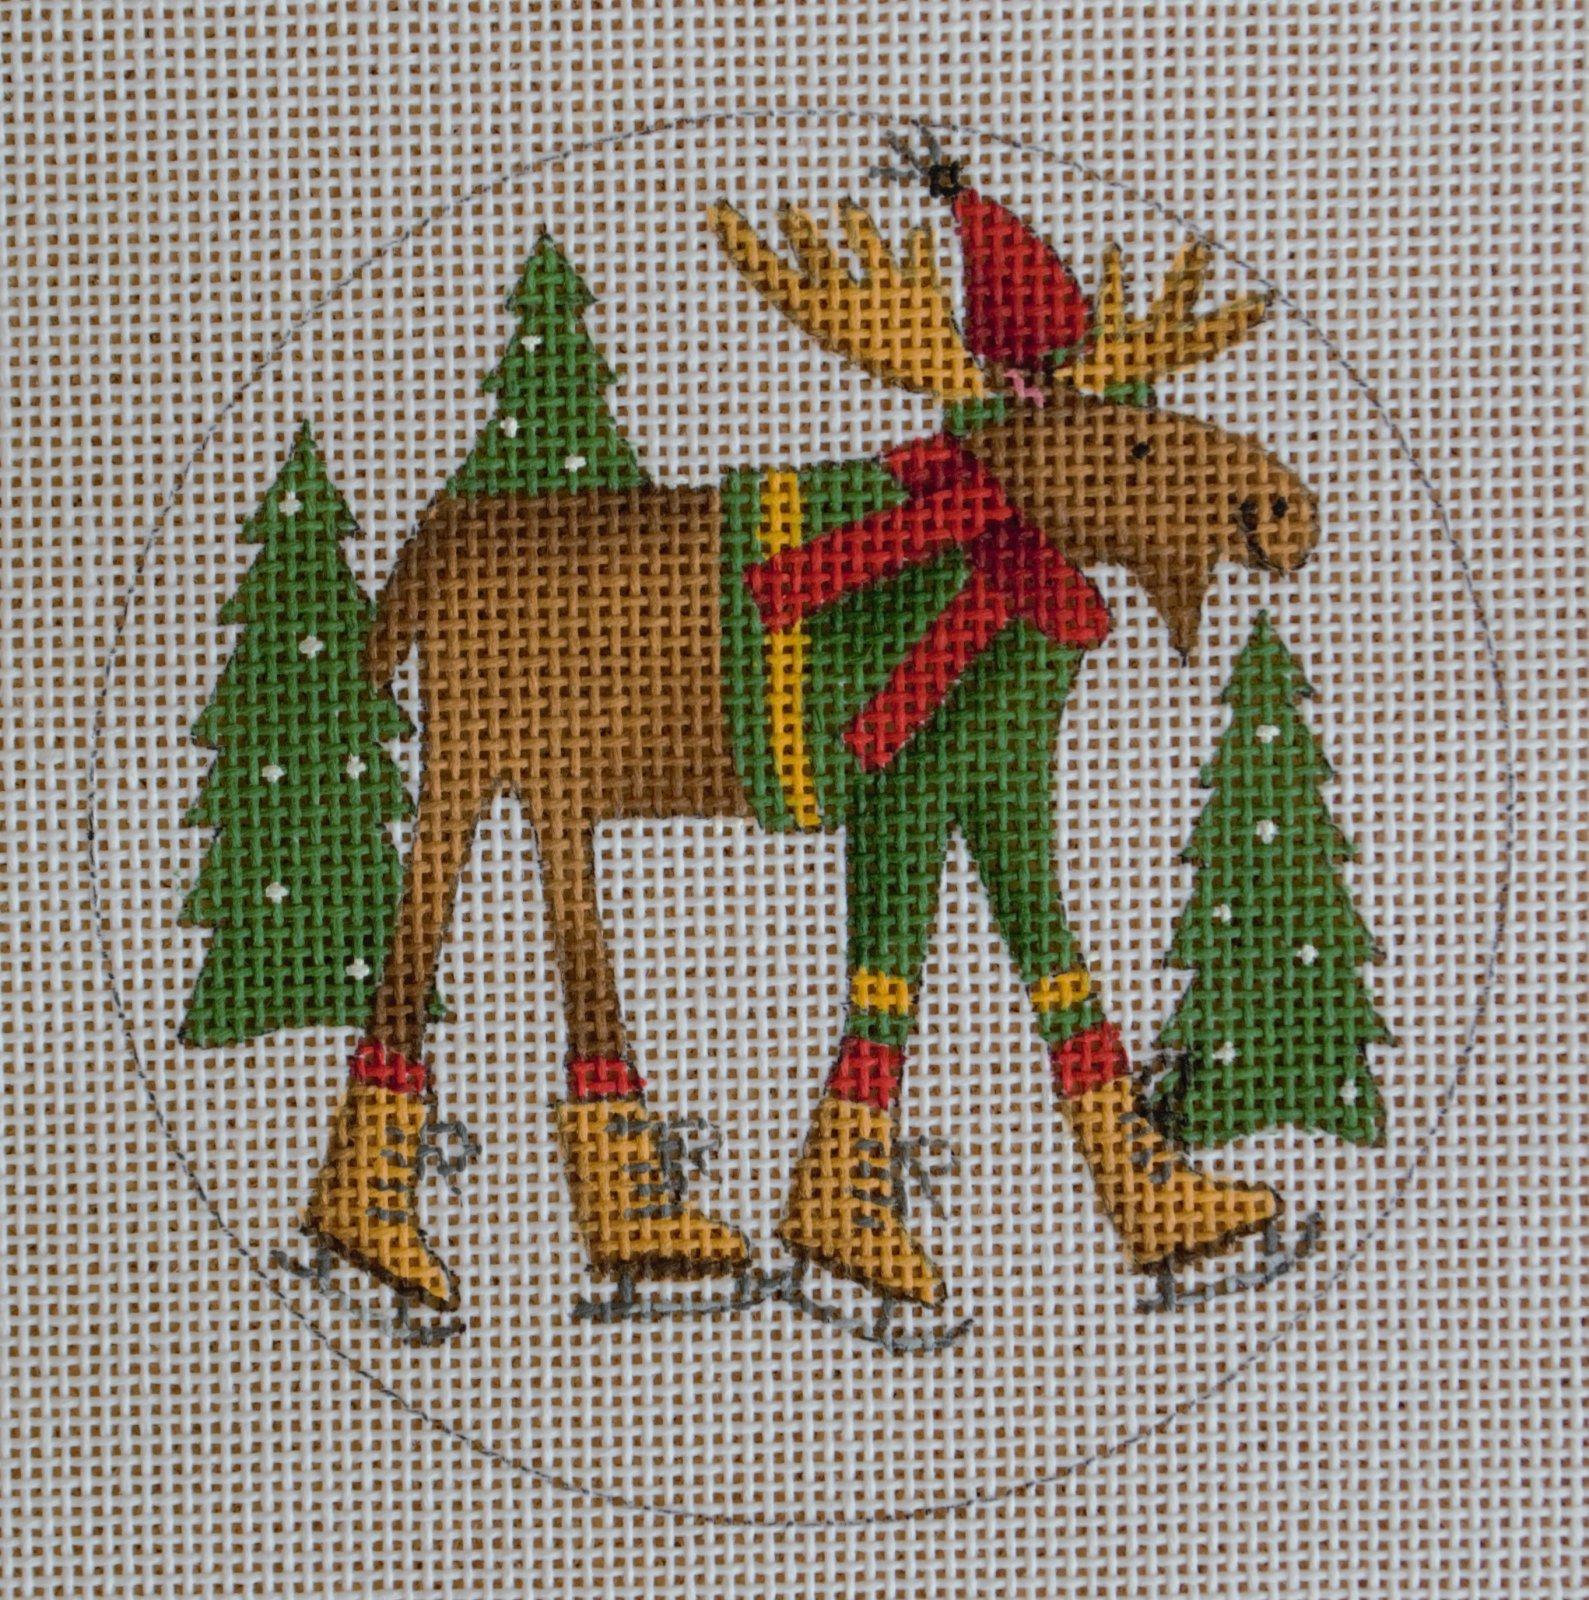 Moose Orn